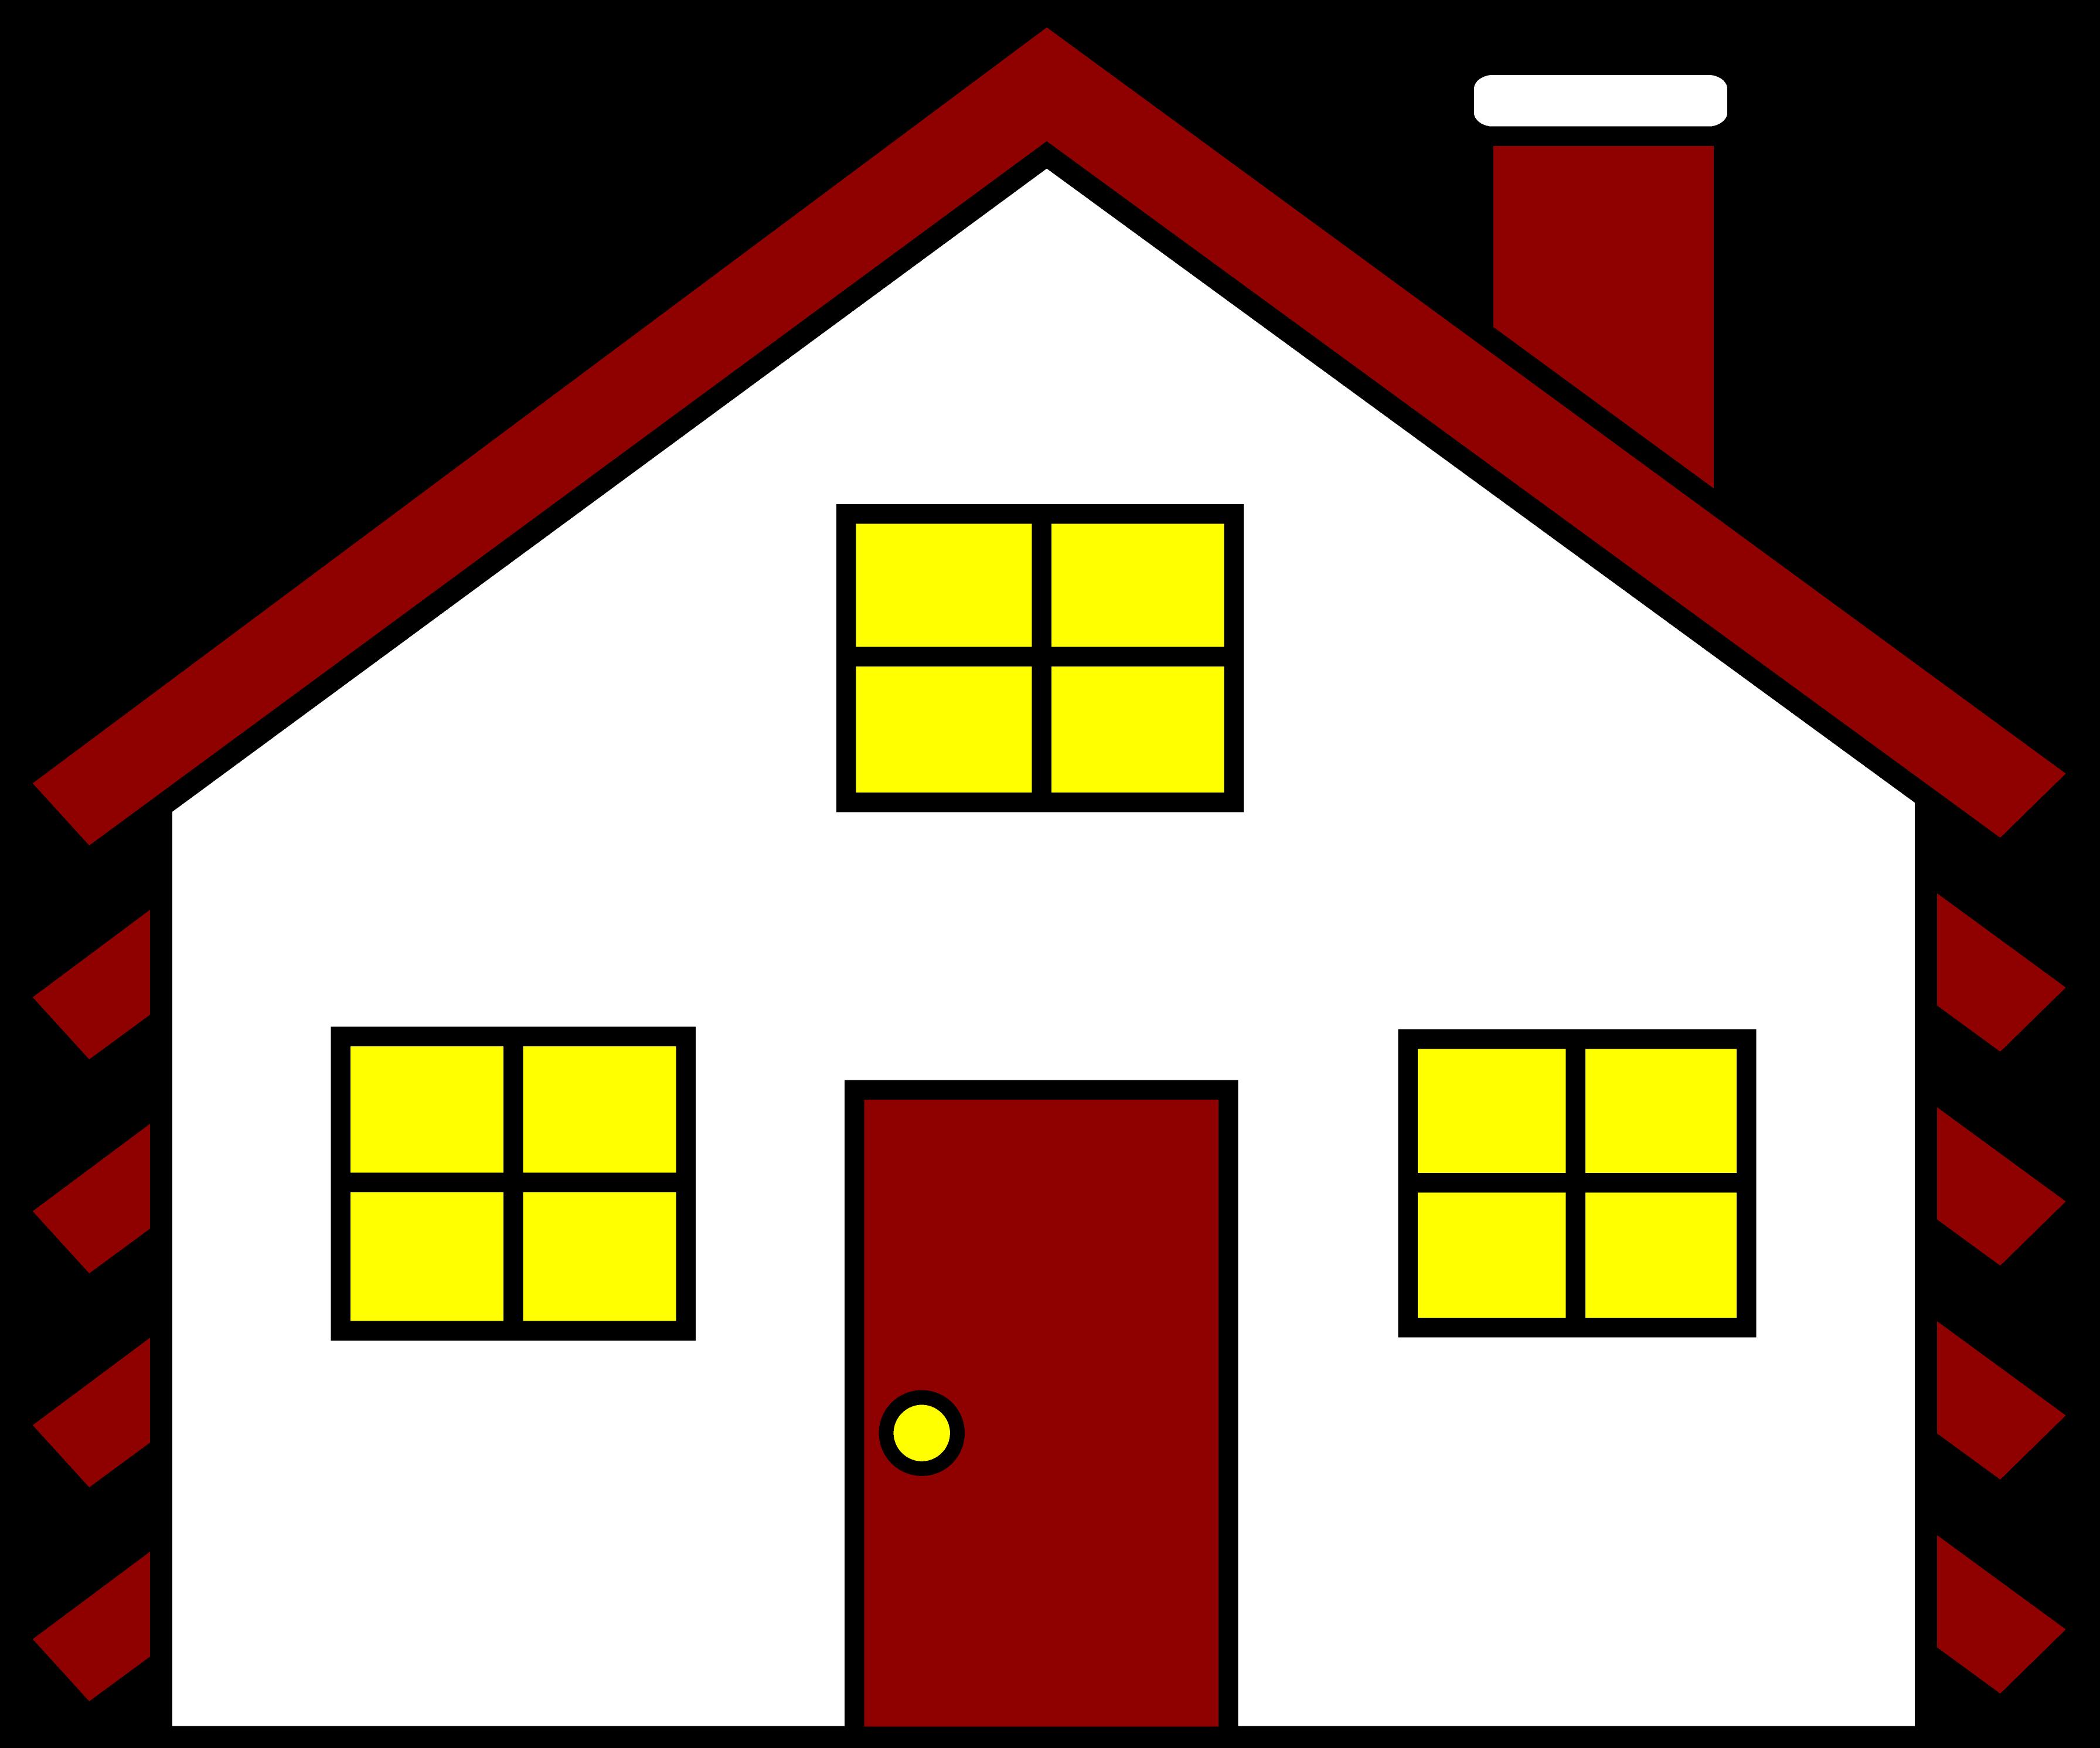 clipart house - House Clipart